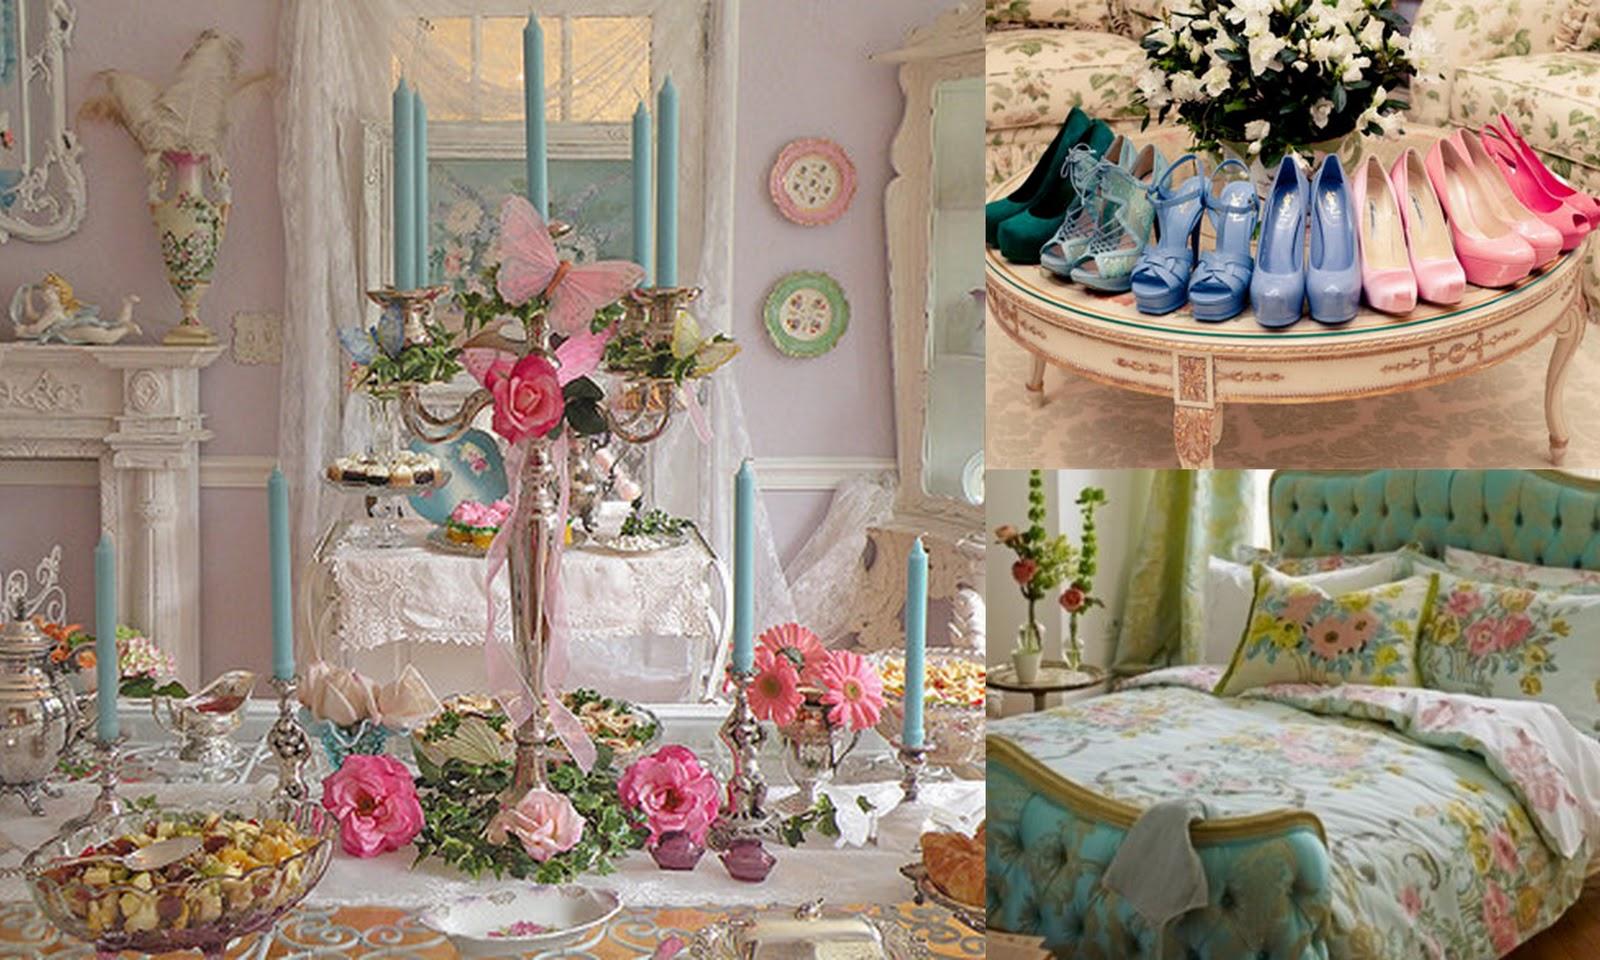 Spanglish Chic: Marie Antoinette Inspired Decor {Decoracion Inspirada por Maria Antonietta}